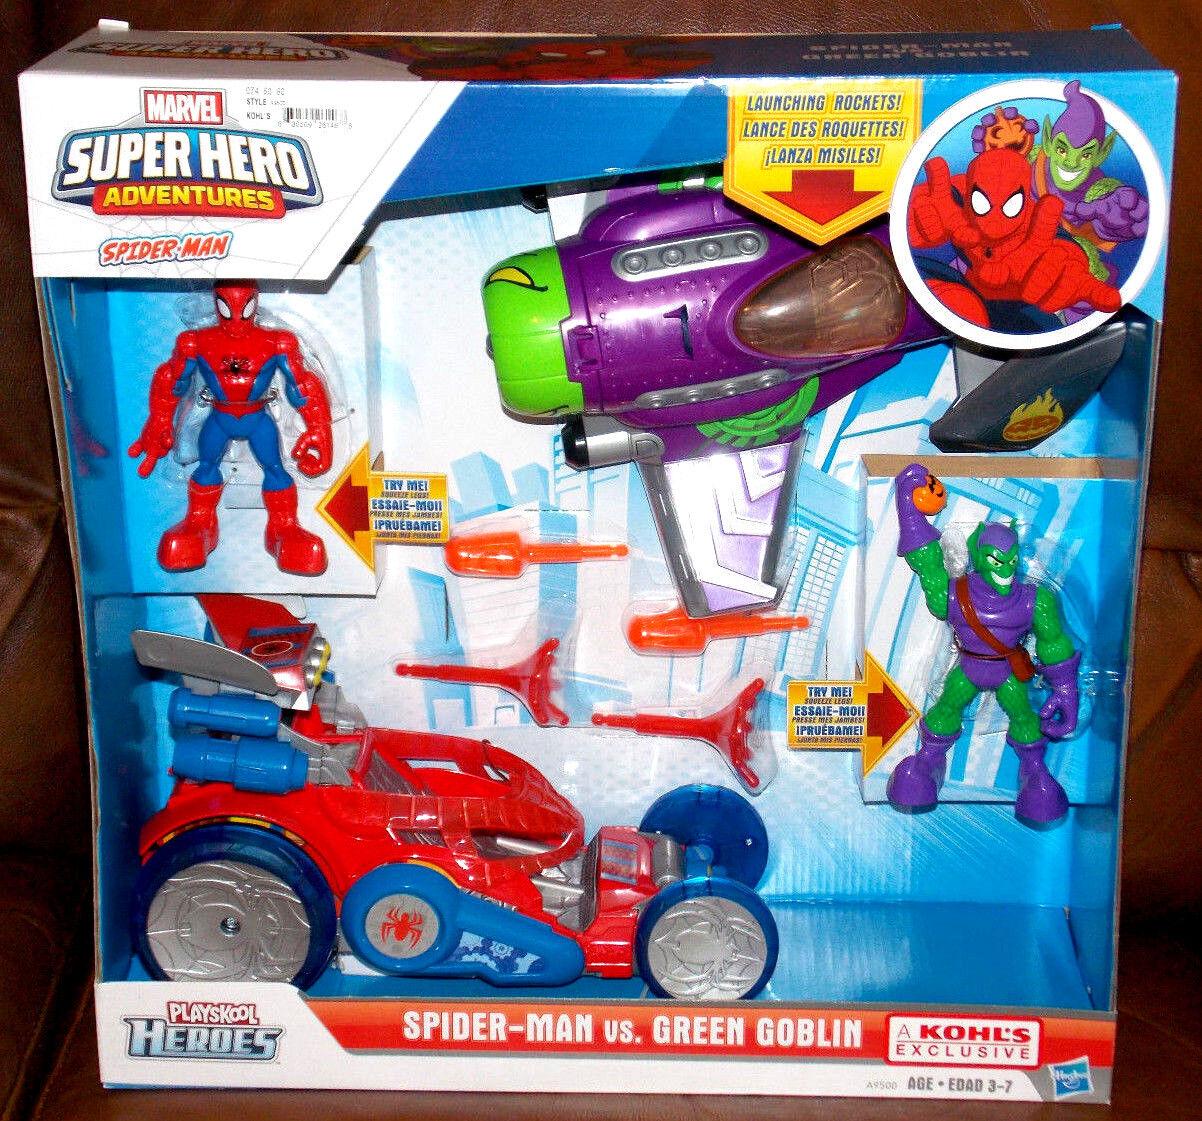 Playskool Heroes Marvel Super Hero Adventures Spider-Man Spider-Man Spider-Man VS. Green Goblin Set d3823e